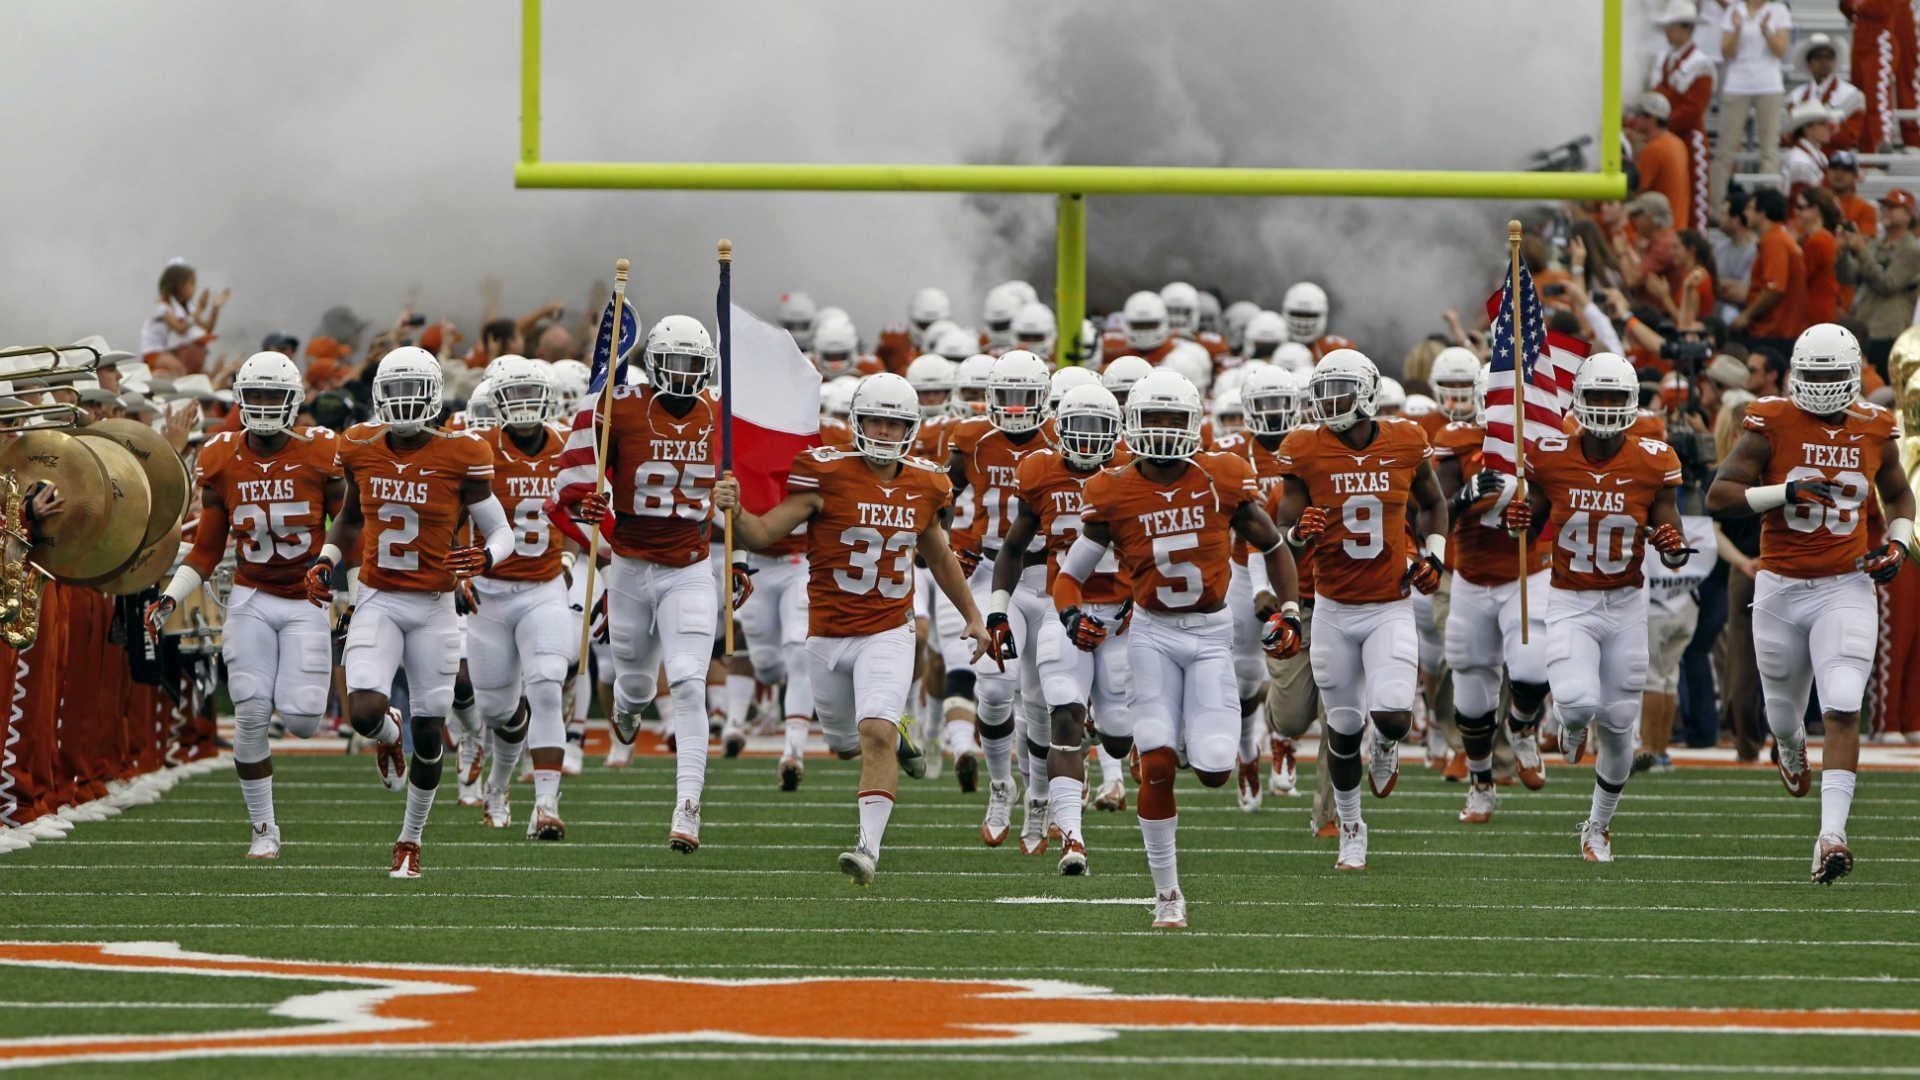 wallpaper.wiki-Texas-Longhorns-Football-HD-Photo-PIC-